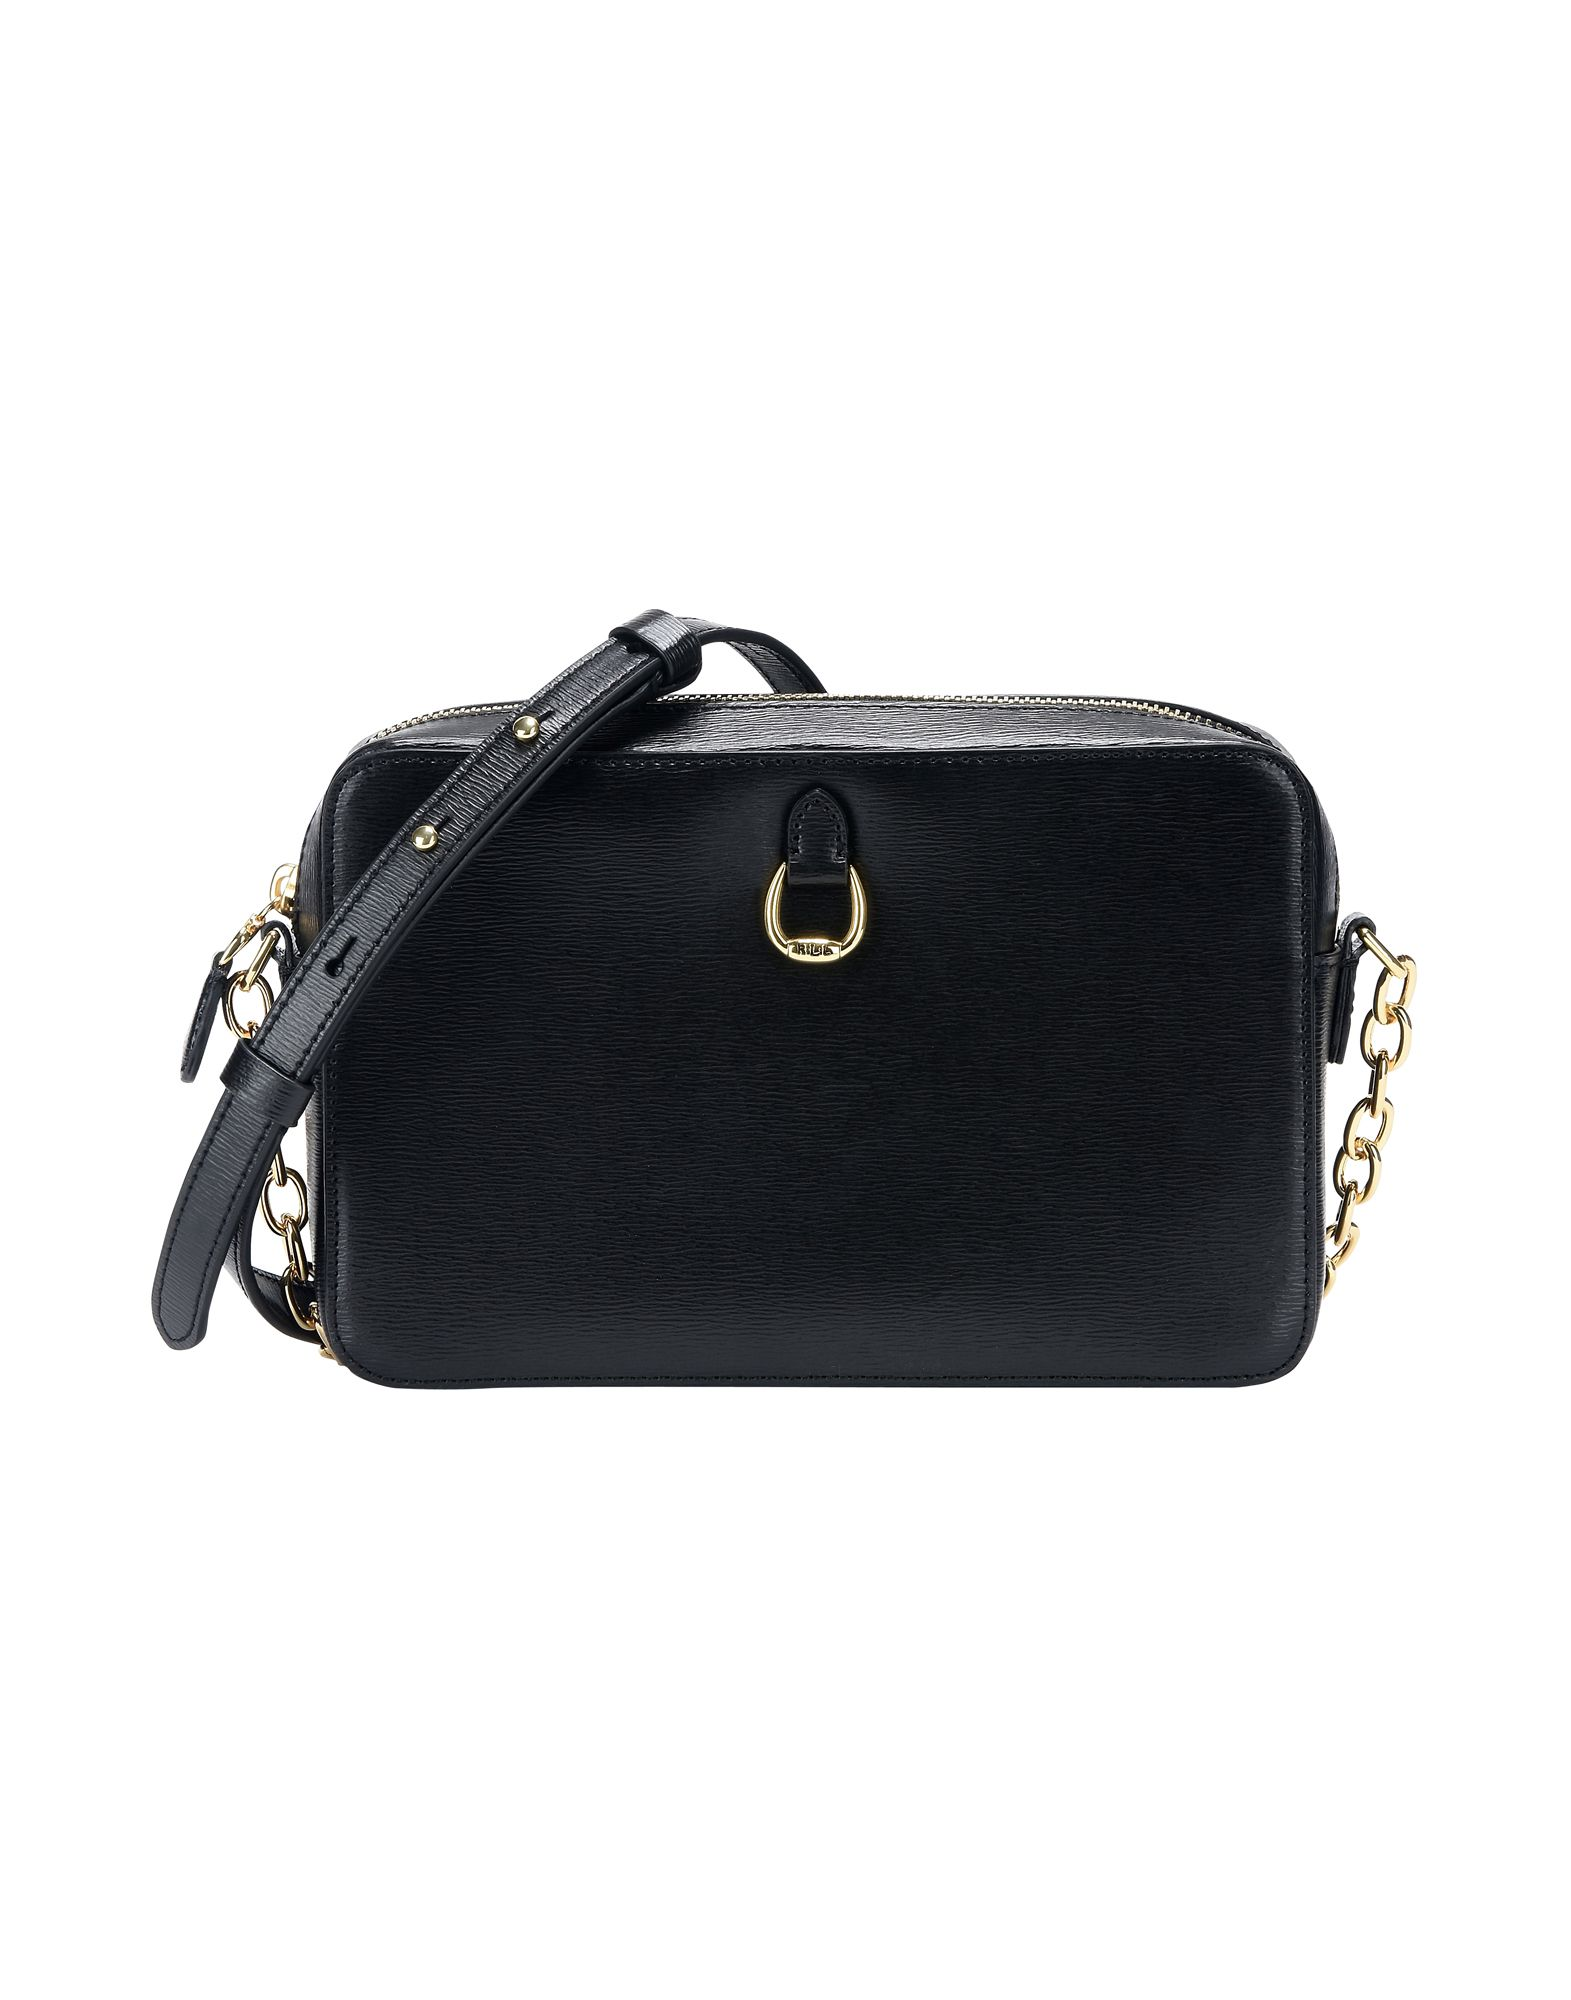 Borsa A Tracolla Lauren Ralph Lauren Camera Bag-Crossbody-Medium - Donna - Acquista online su